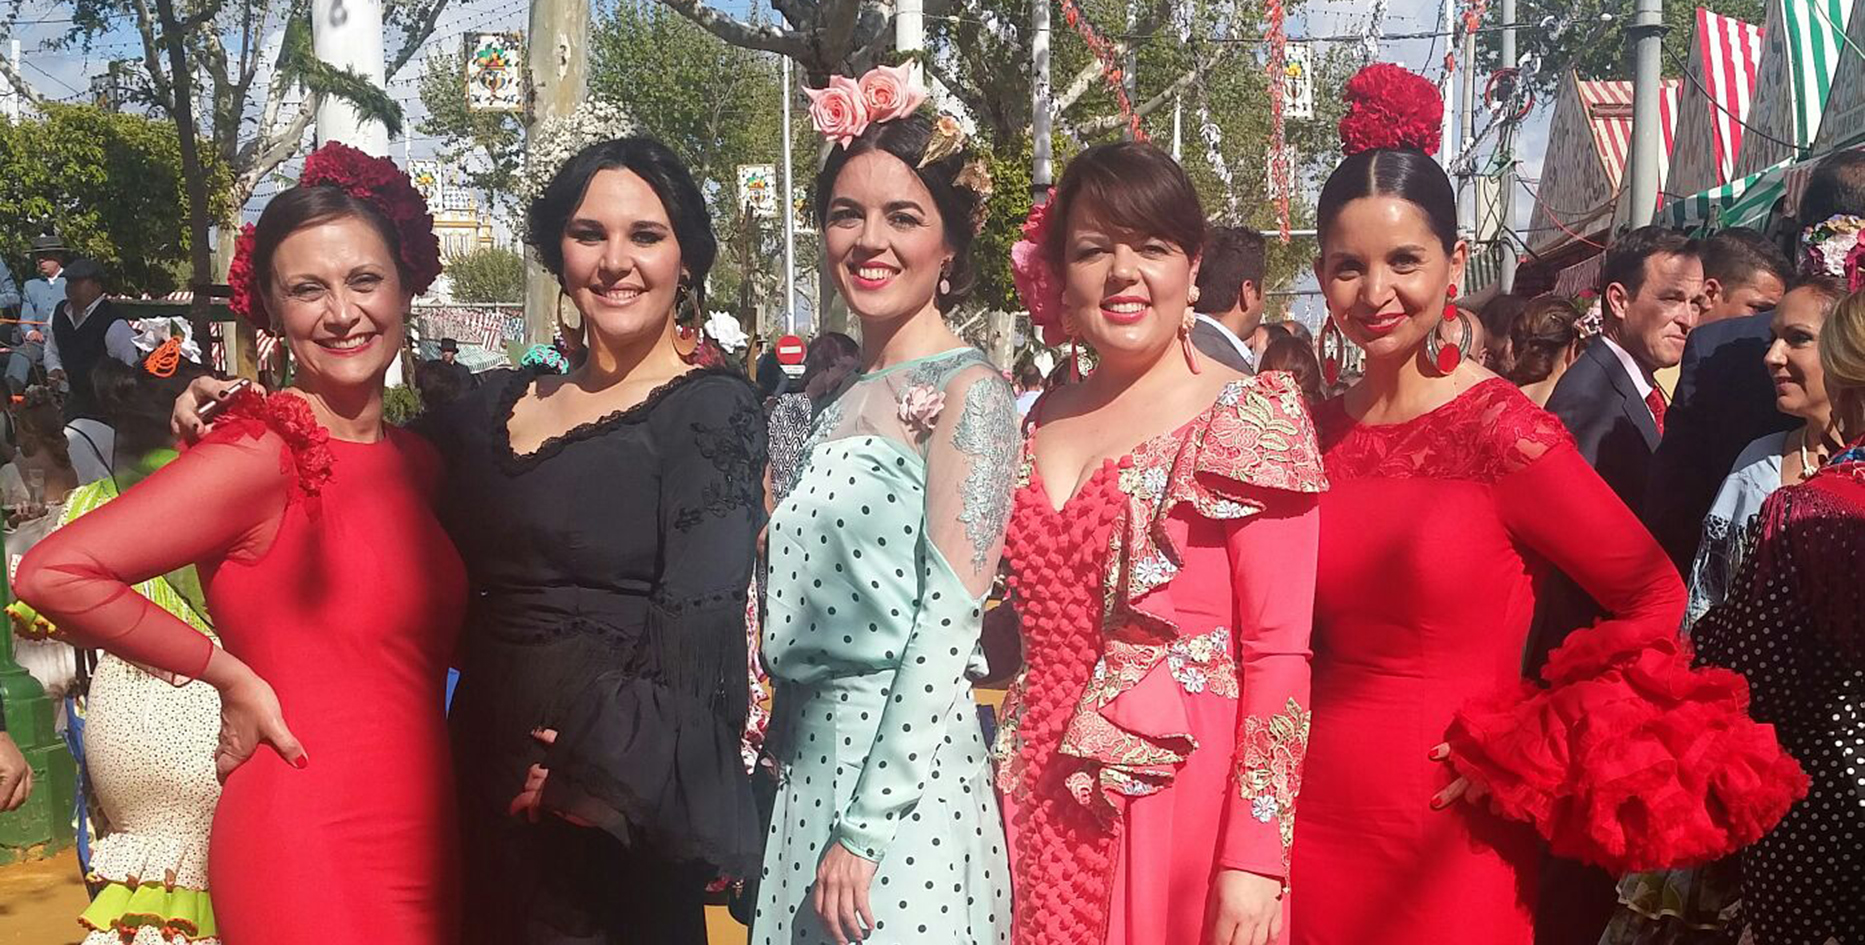 Flamencas en la Feria de Sevilla 2016